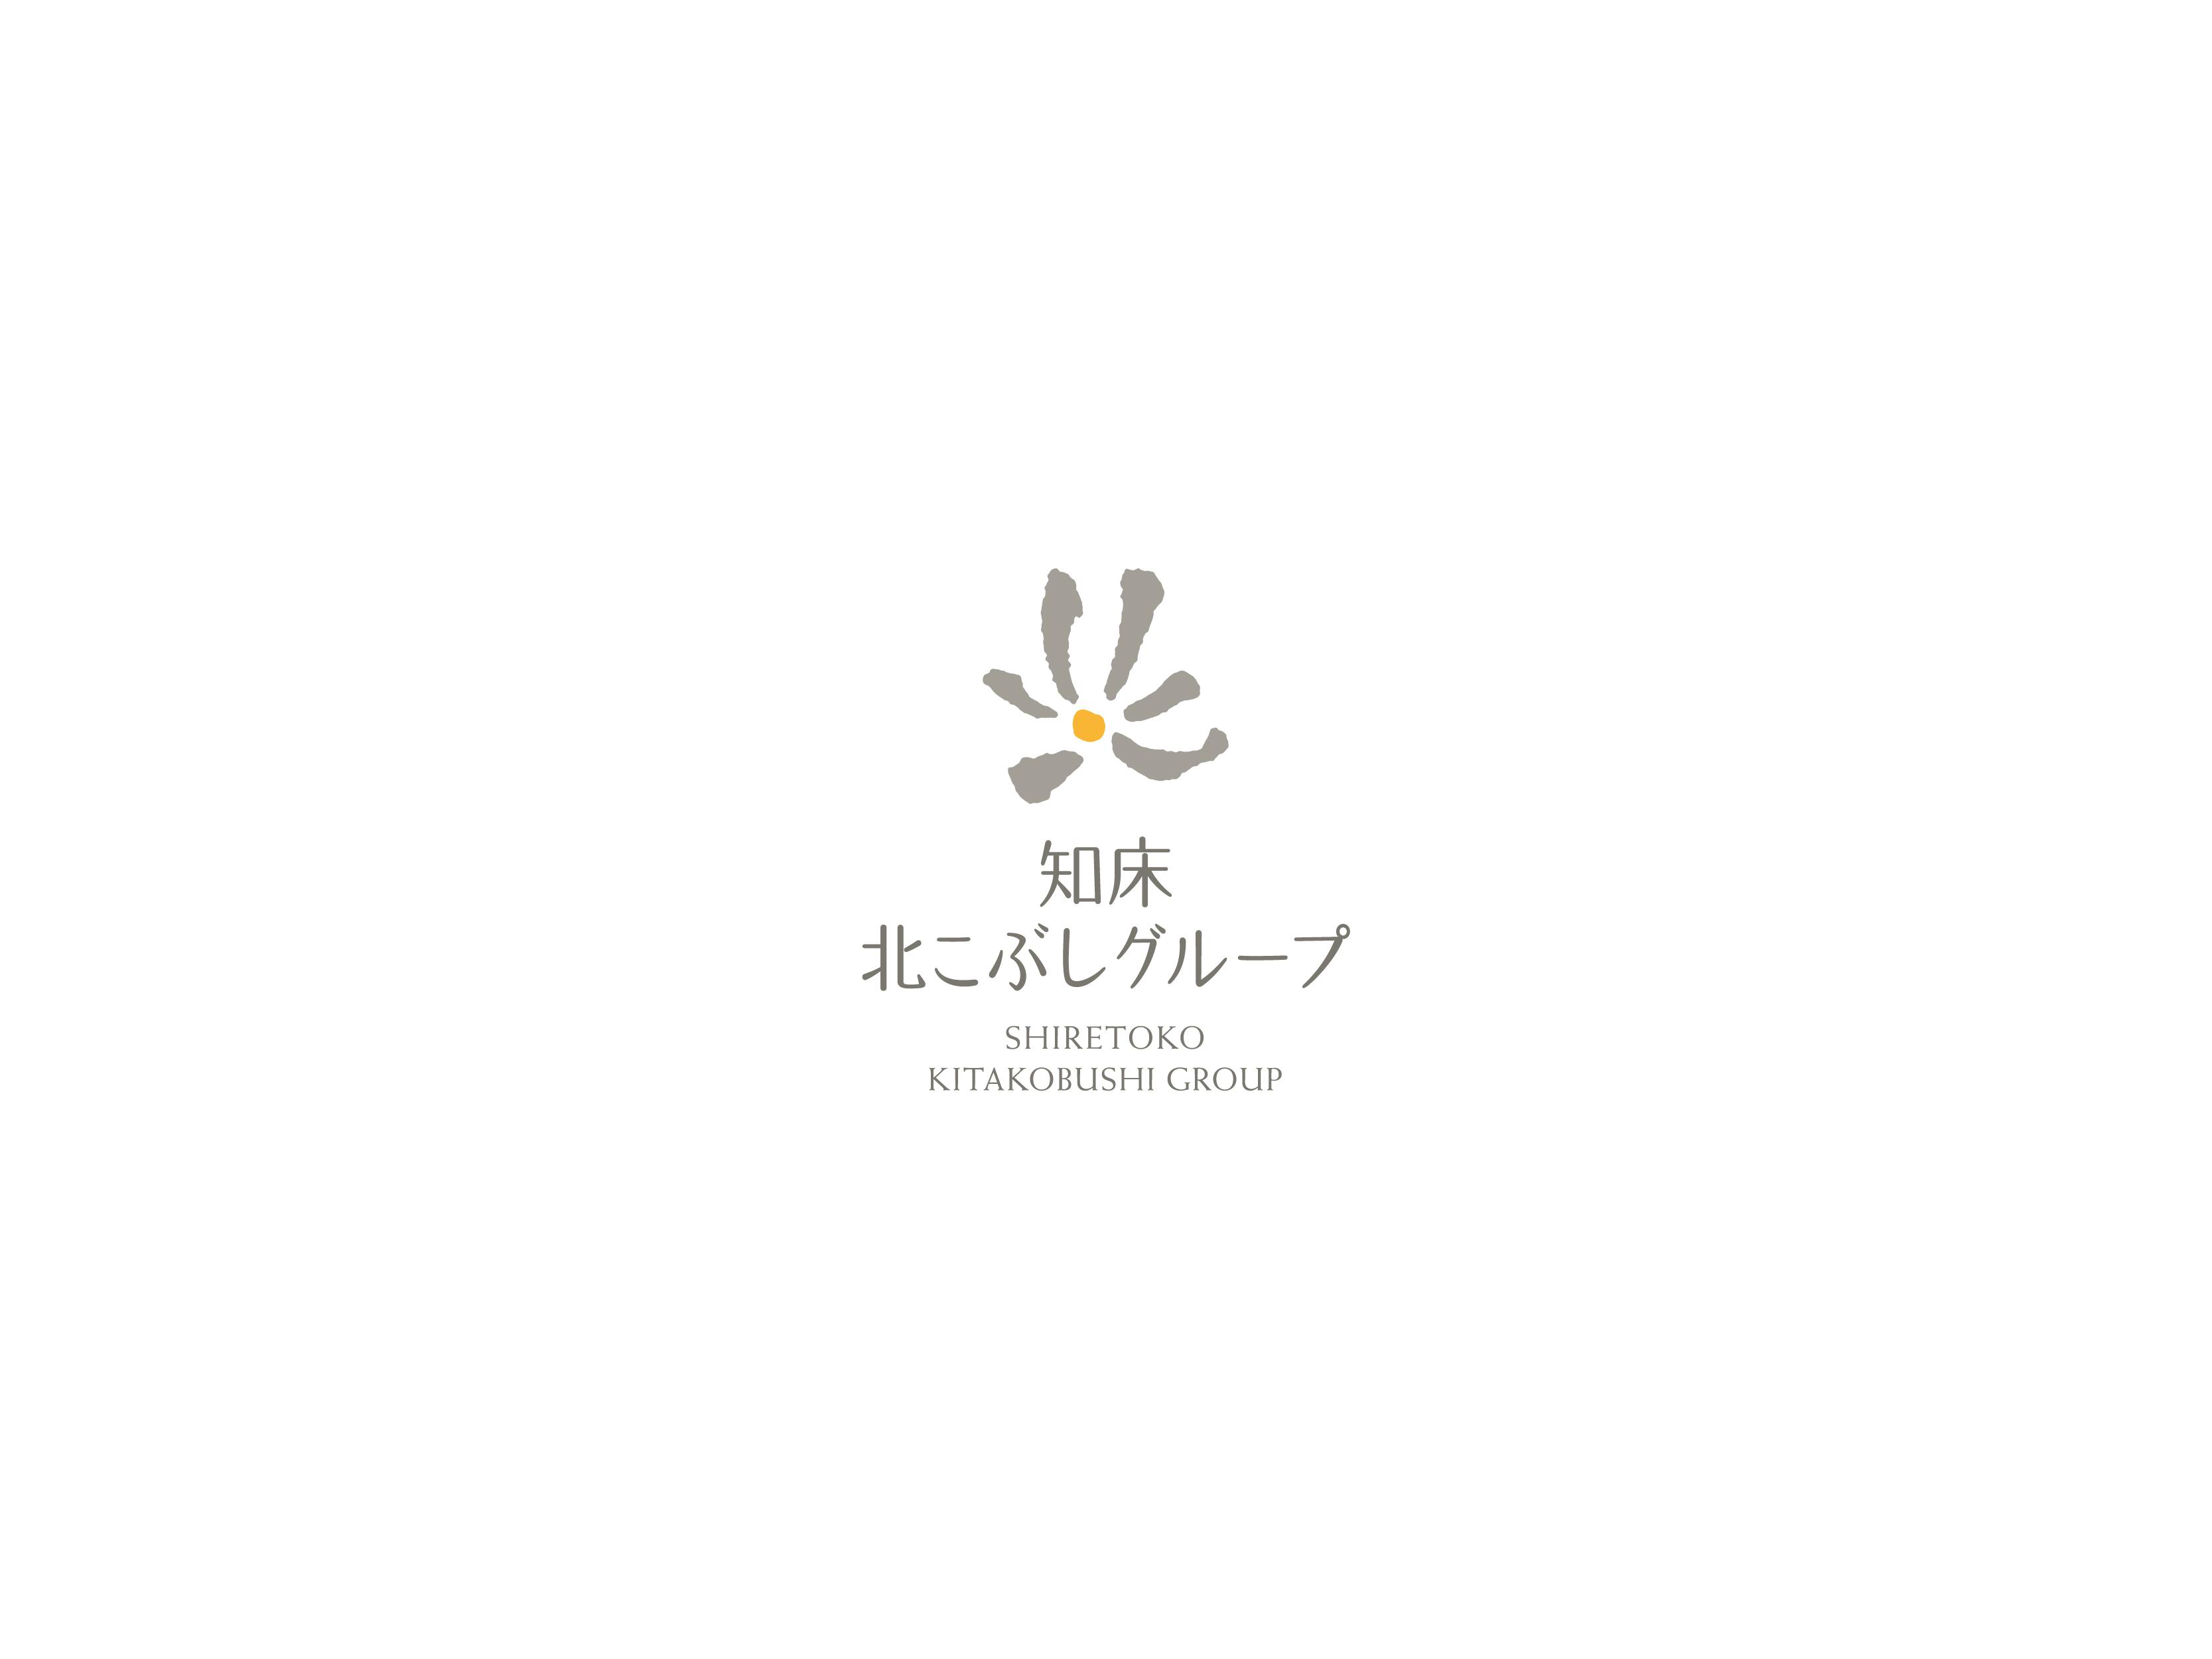 <span>logo</span><br>知床北こぶしグループ